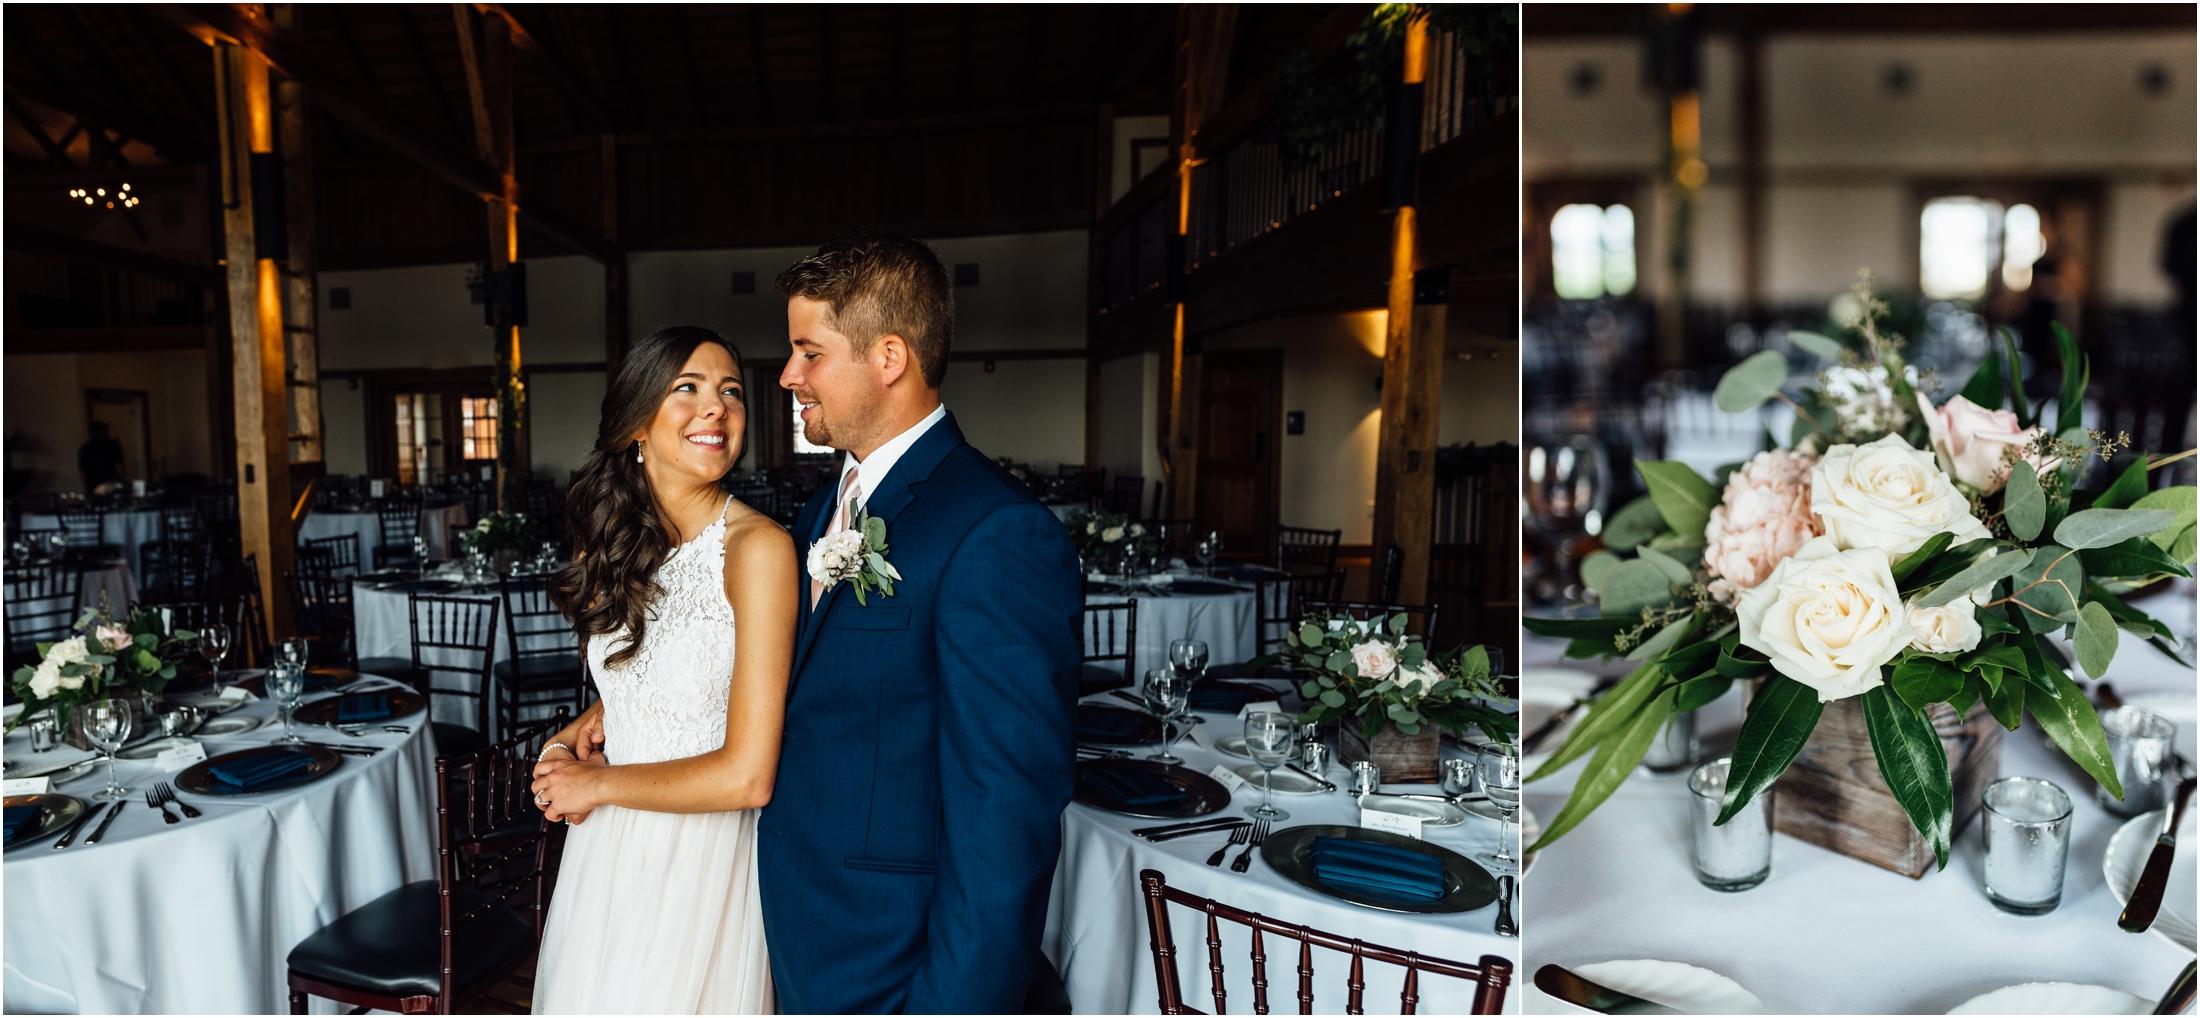 Steph&Bryan_Lancaster_wedding_farm_0534.jpg